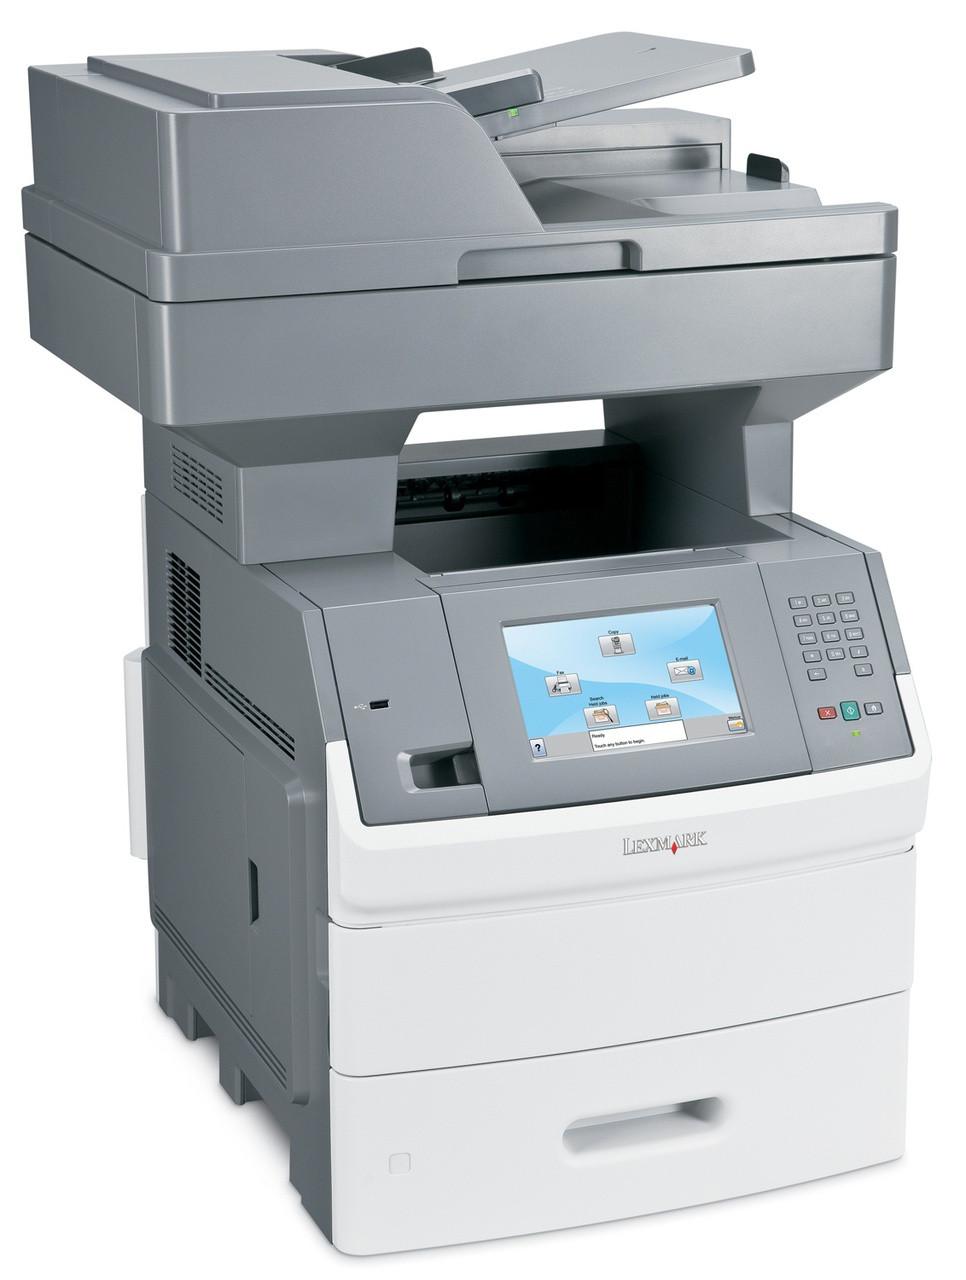 Lexmark x654de MFP - 16M1265 - Lexmark Laser Printer for sale